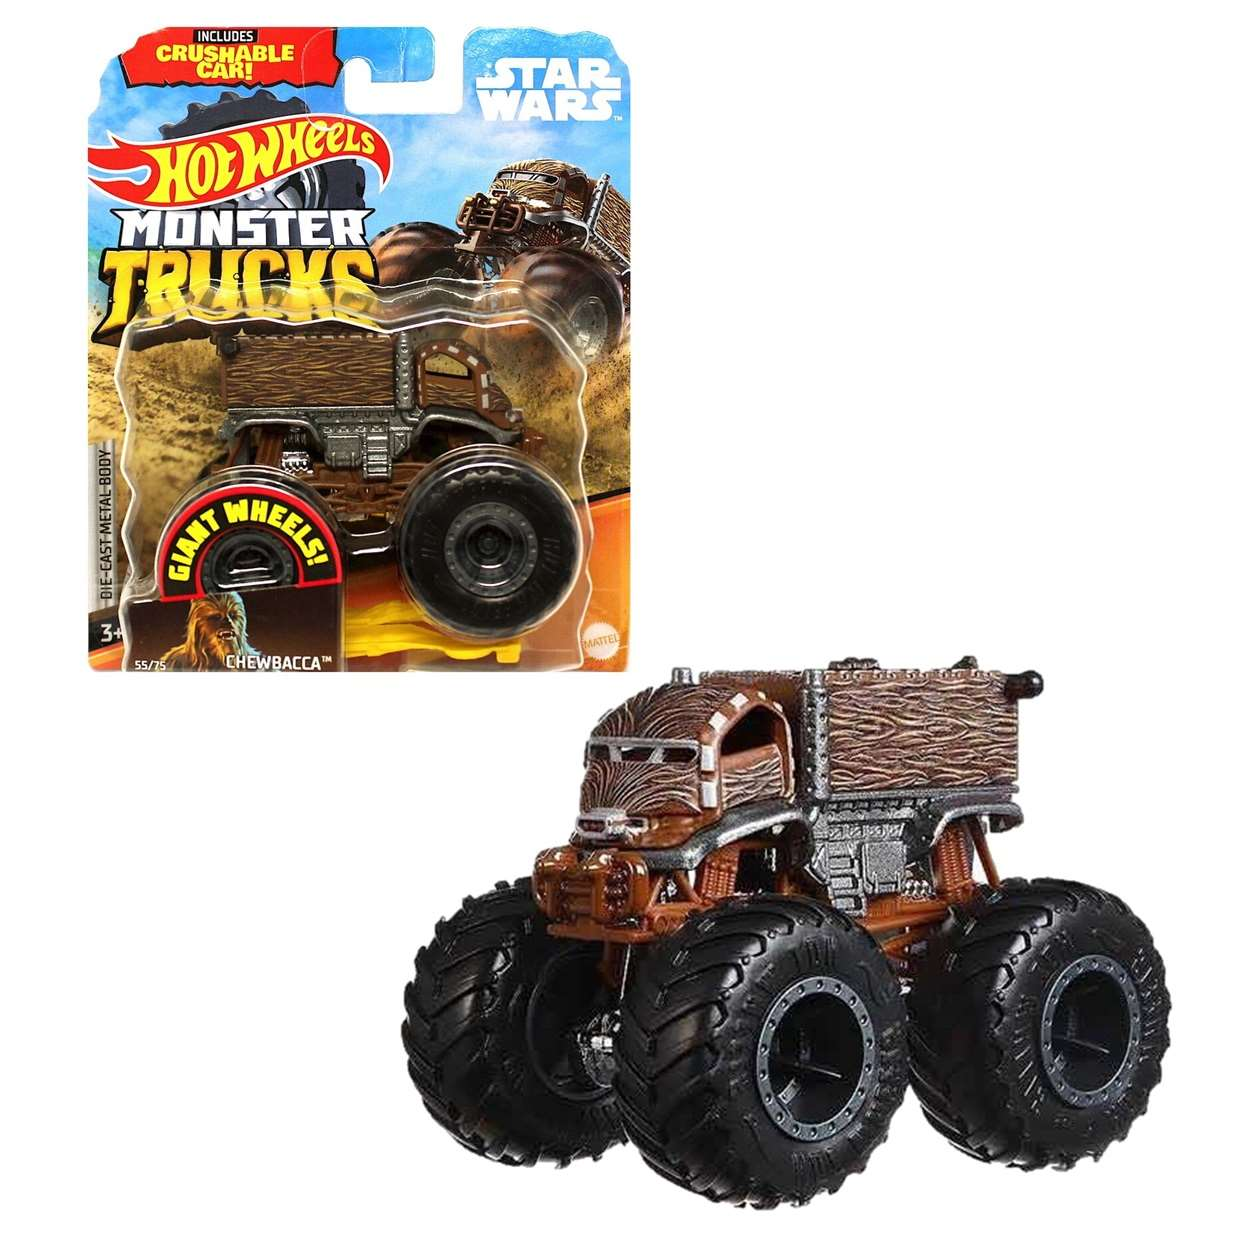 Chewbacca Star Wars 55/75 Hot Wheels Monster Trucks